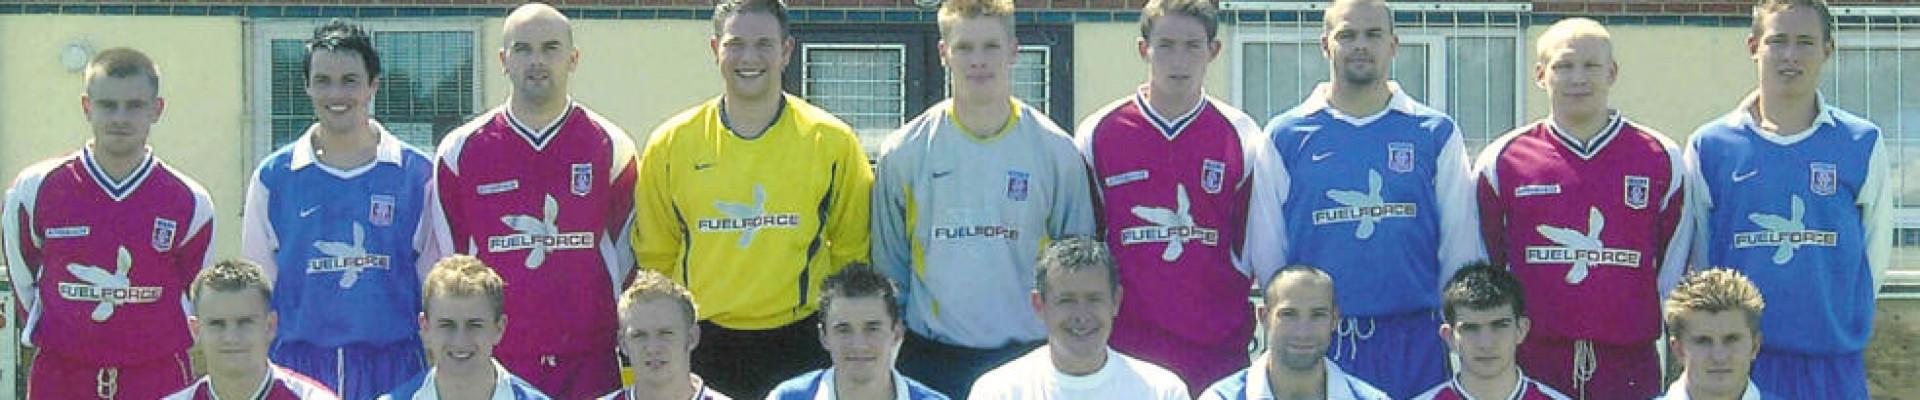 Team Photo 2004/05 Season